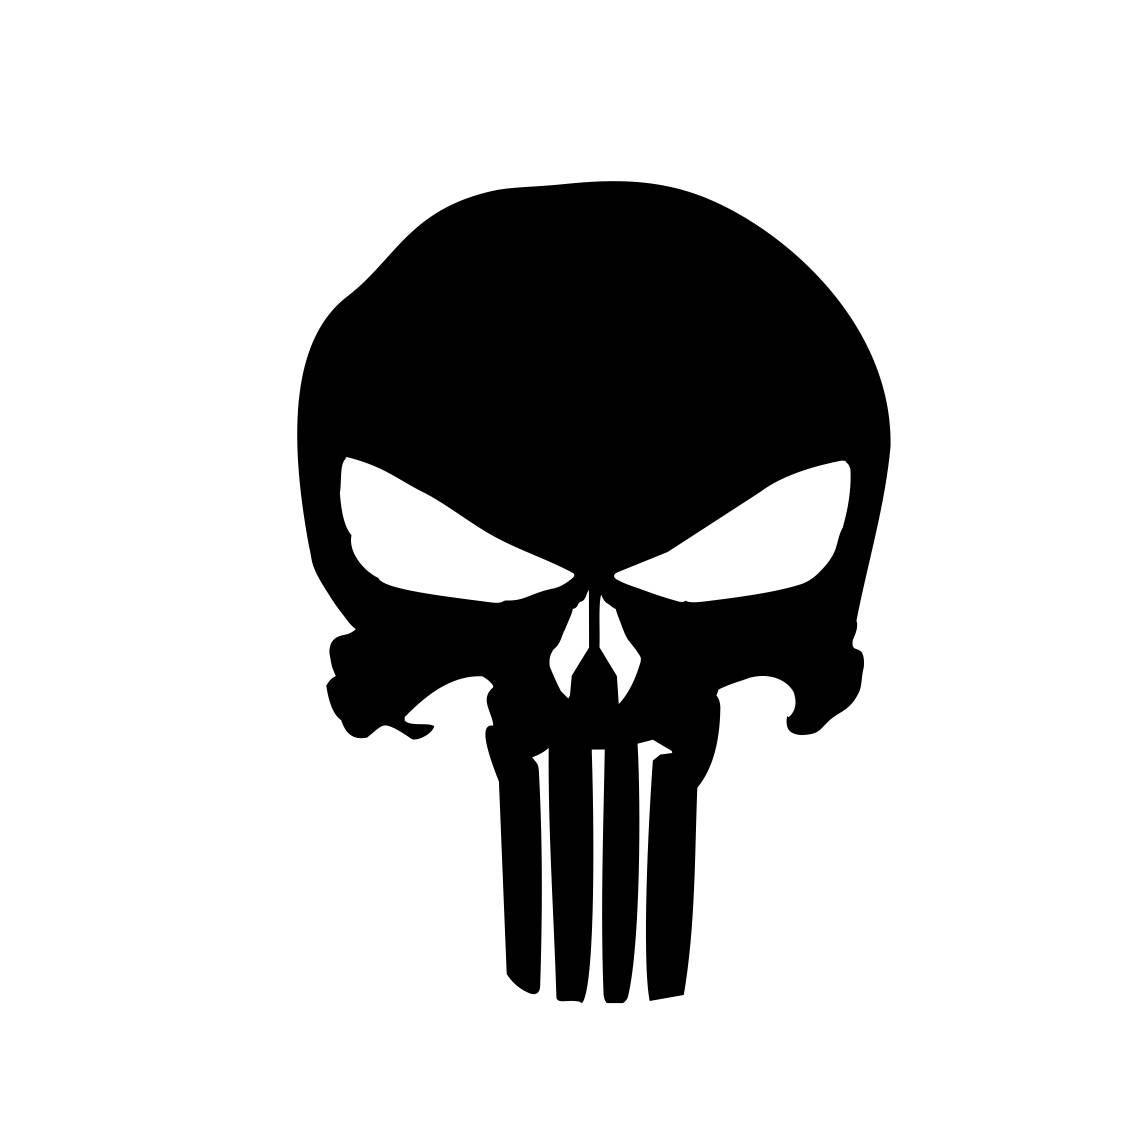 The Punisher Skull Marvel Comics Frank Castle Graphics Svg Dxf Eps Png Cdr Ai Pdf Vector Art Clipart Instant Download Di Elementos Graficos Justiceiro Estampas